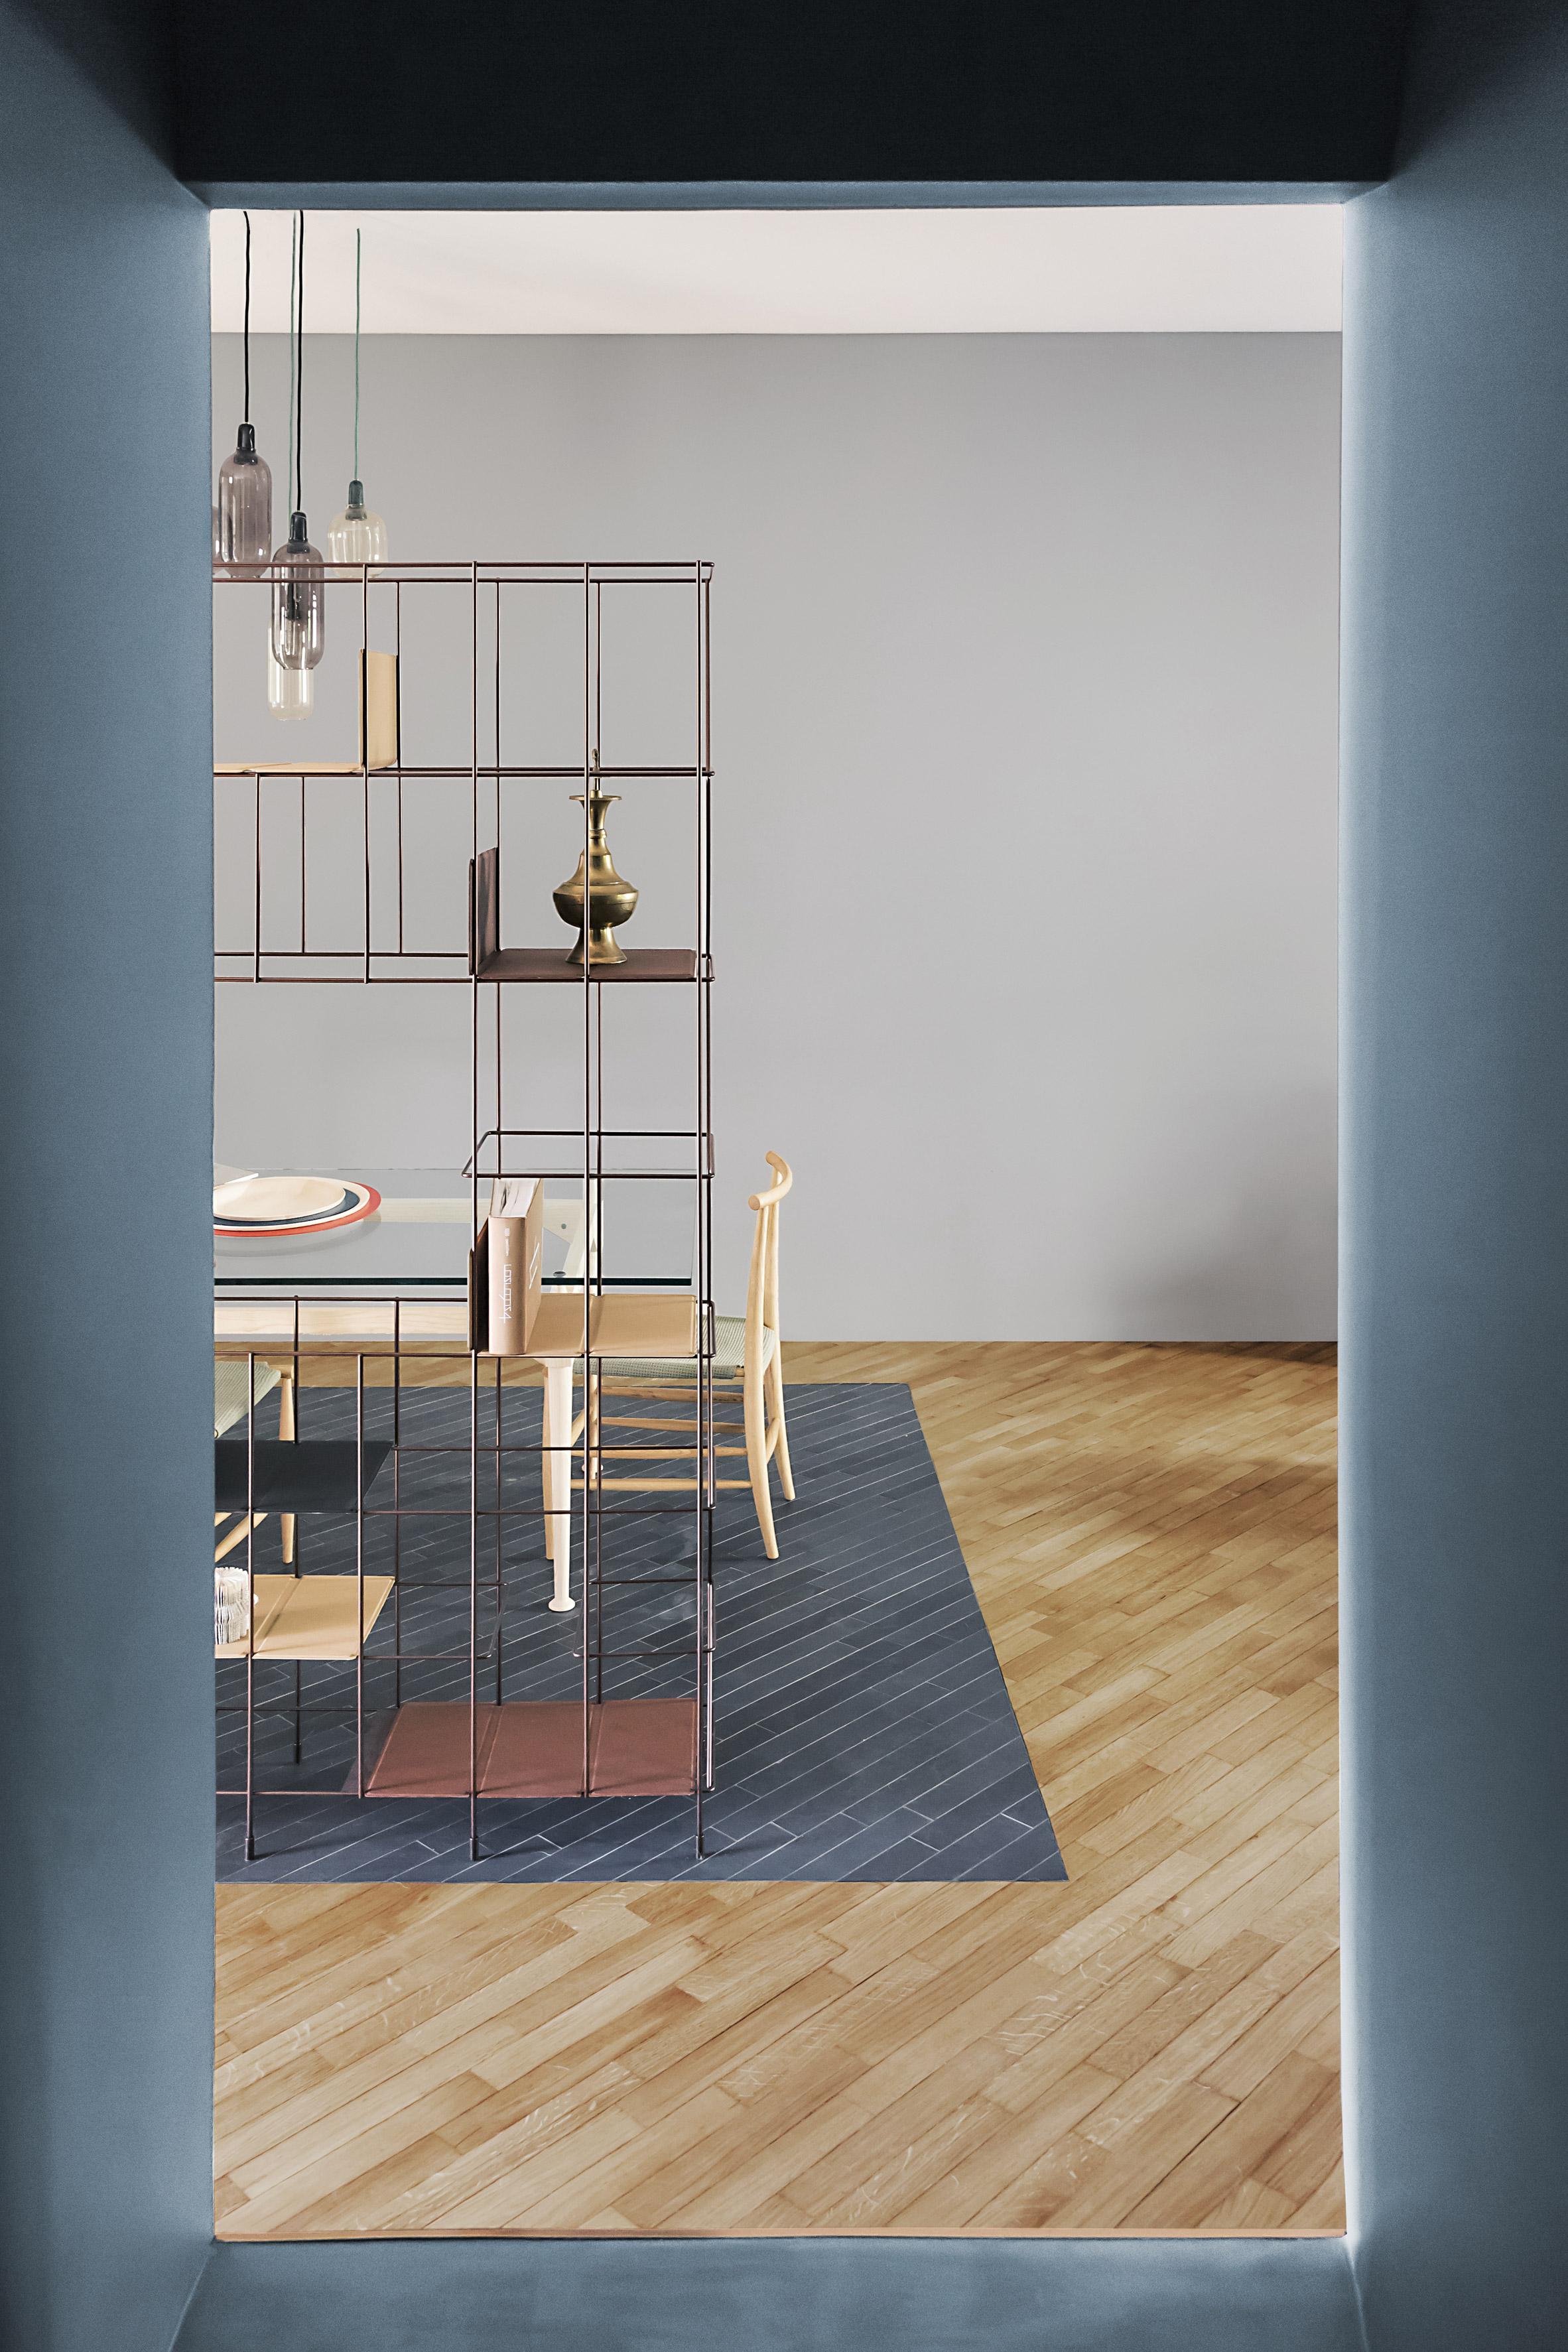 architecture-house-residential-design-studia-interiors-osnovadesign-osnova-poltava_06